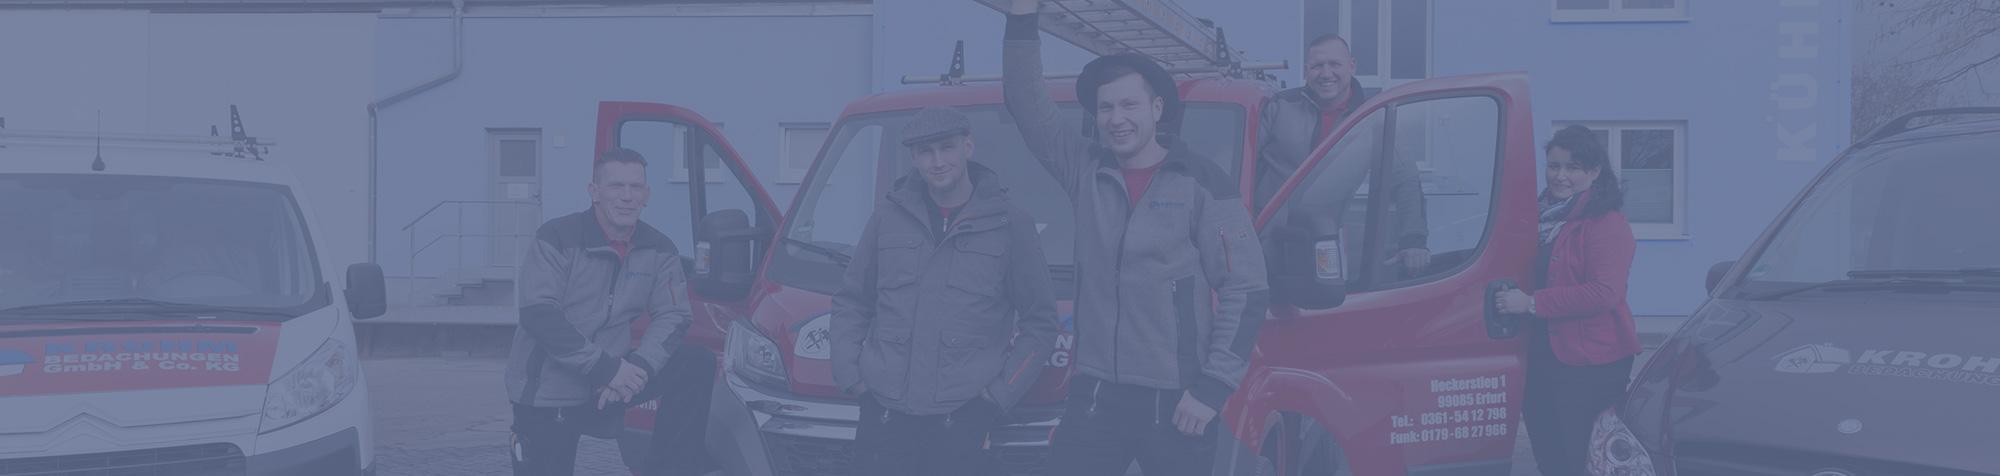 Krohm-Bedachungen GmbH & Co. KG